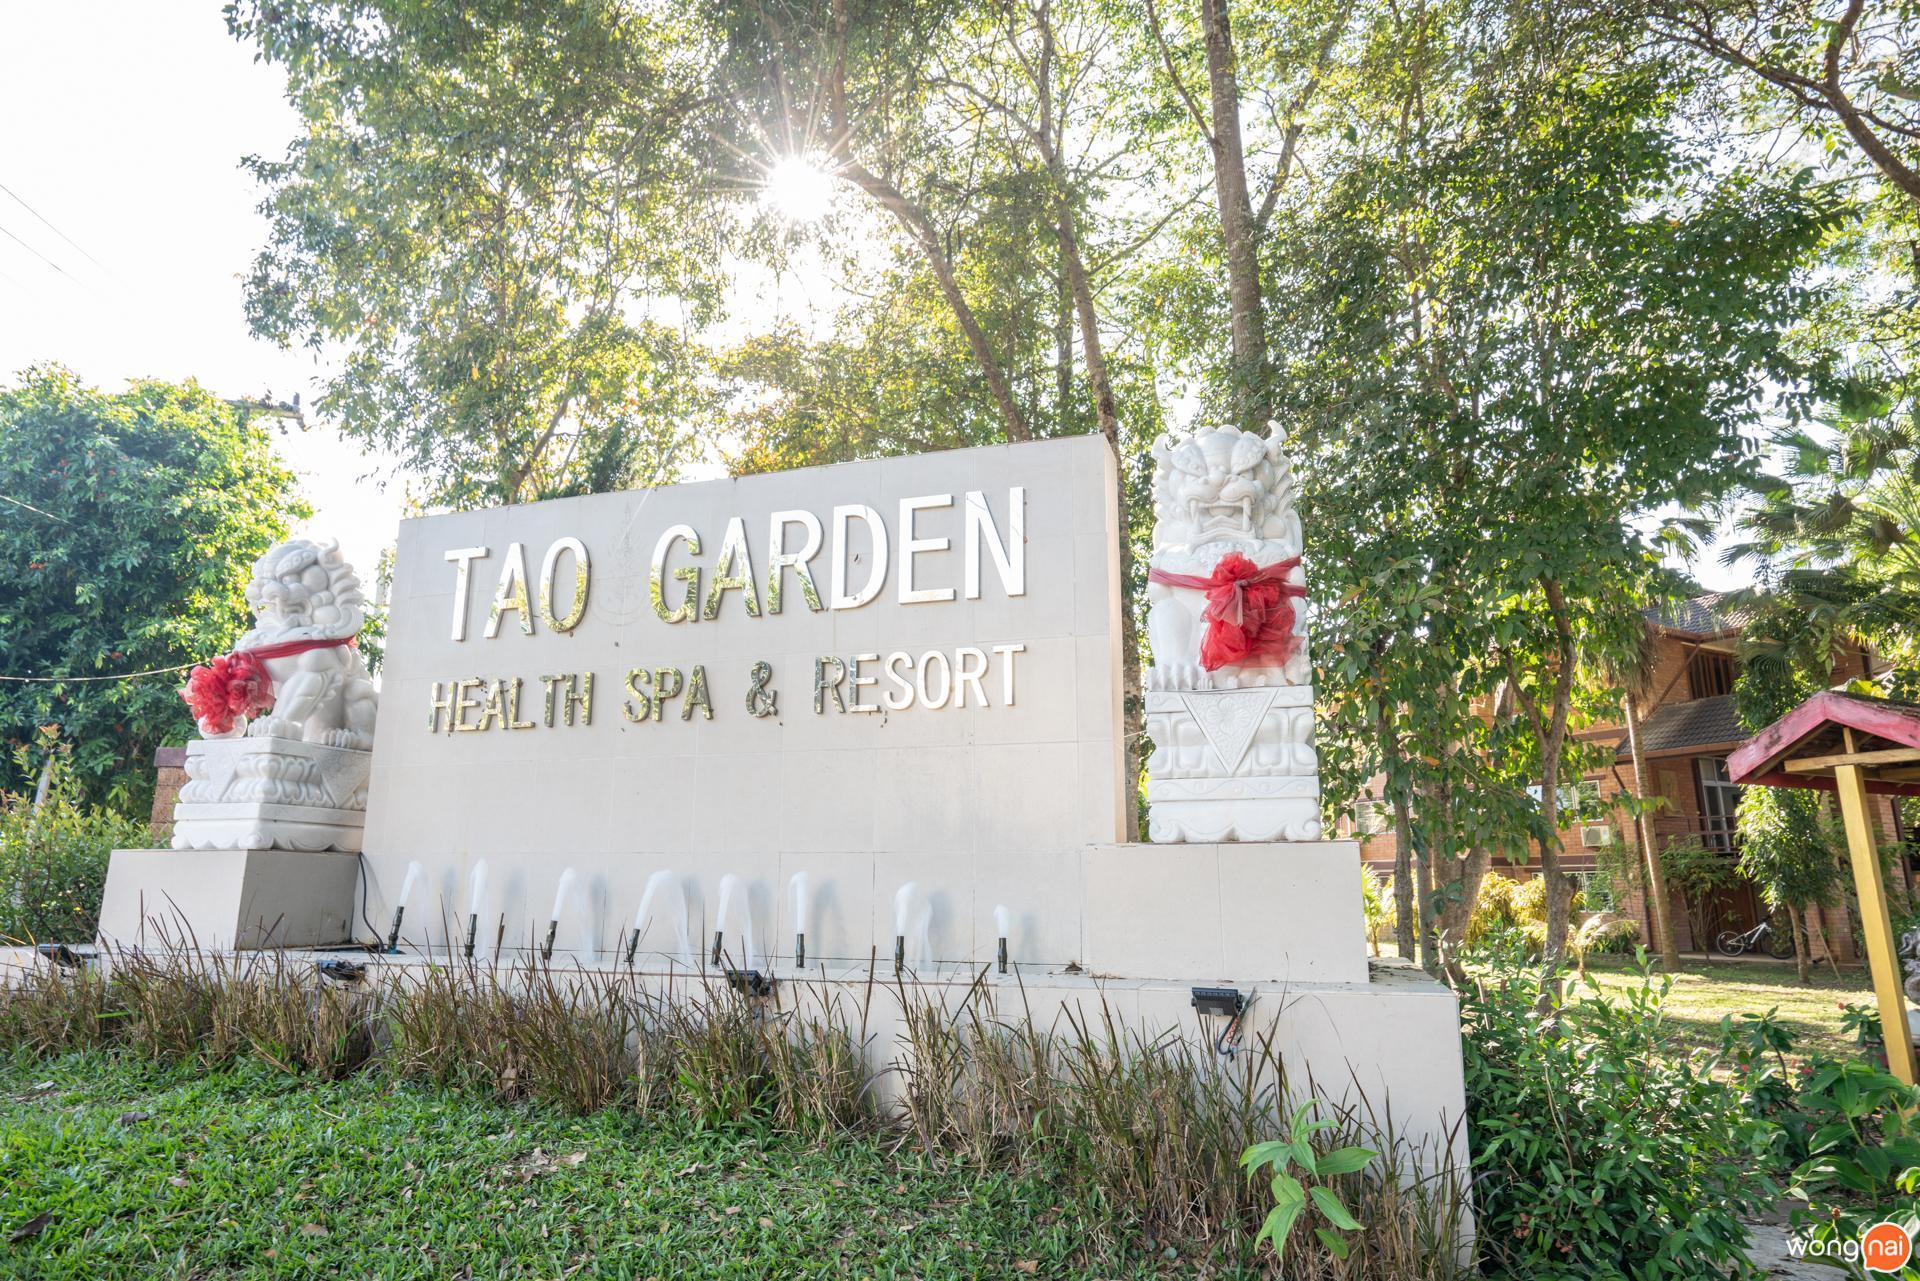 Tao Garden Health Spa And Resort